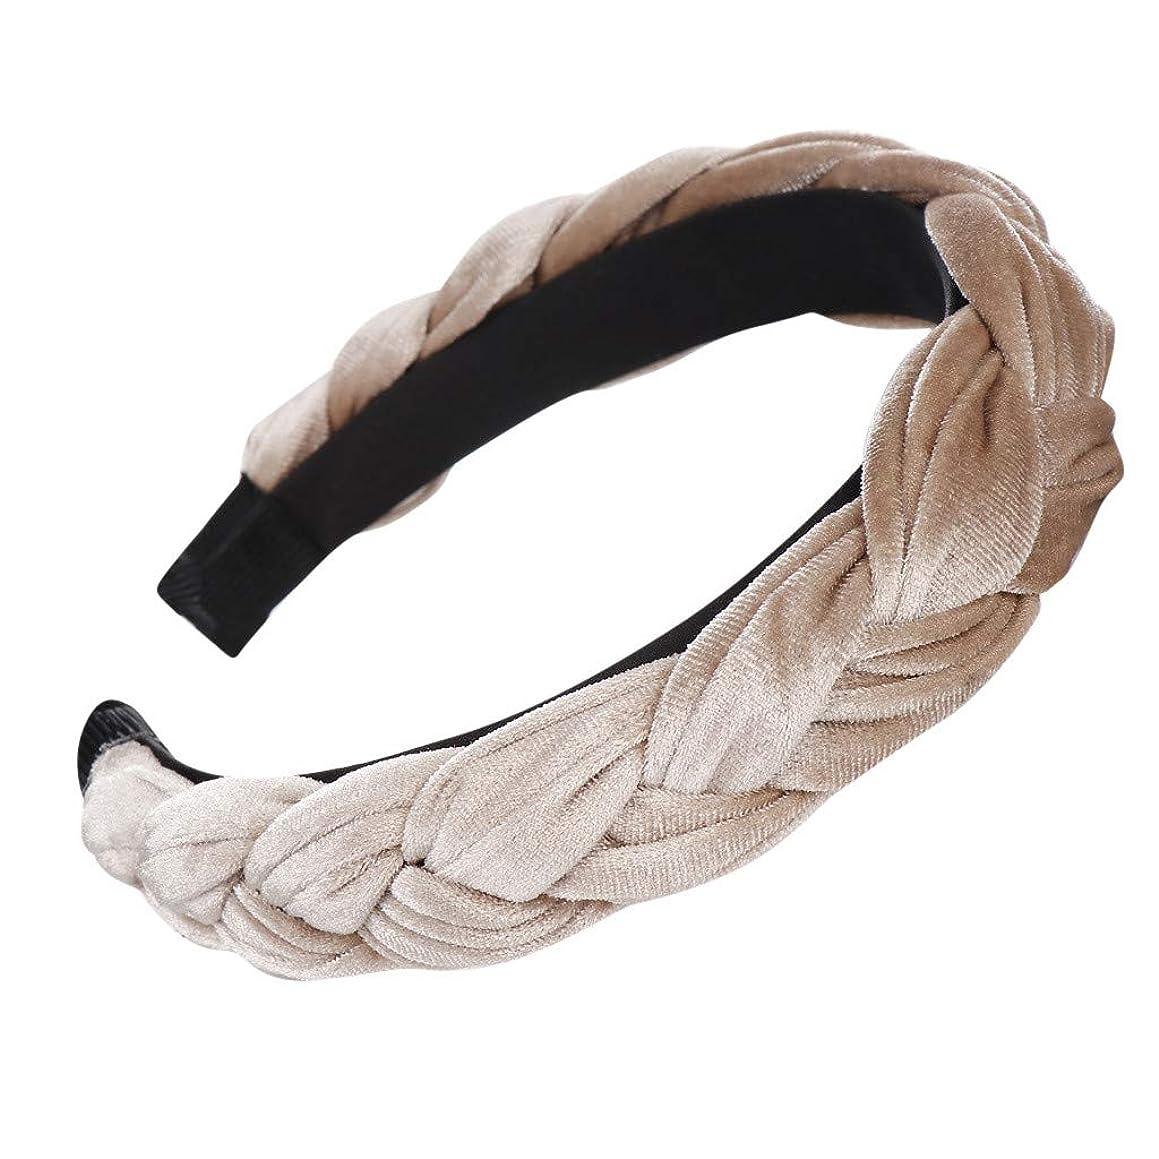 HAPIGOOD Women's Velvet Braid Headband Fashion Stitching Color Bow Knot Print Simple Sweet Hair Accessories (Khaki)